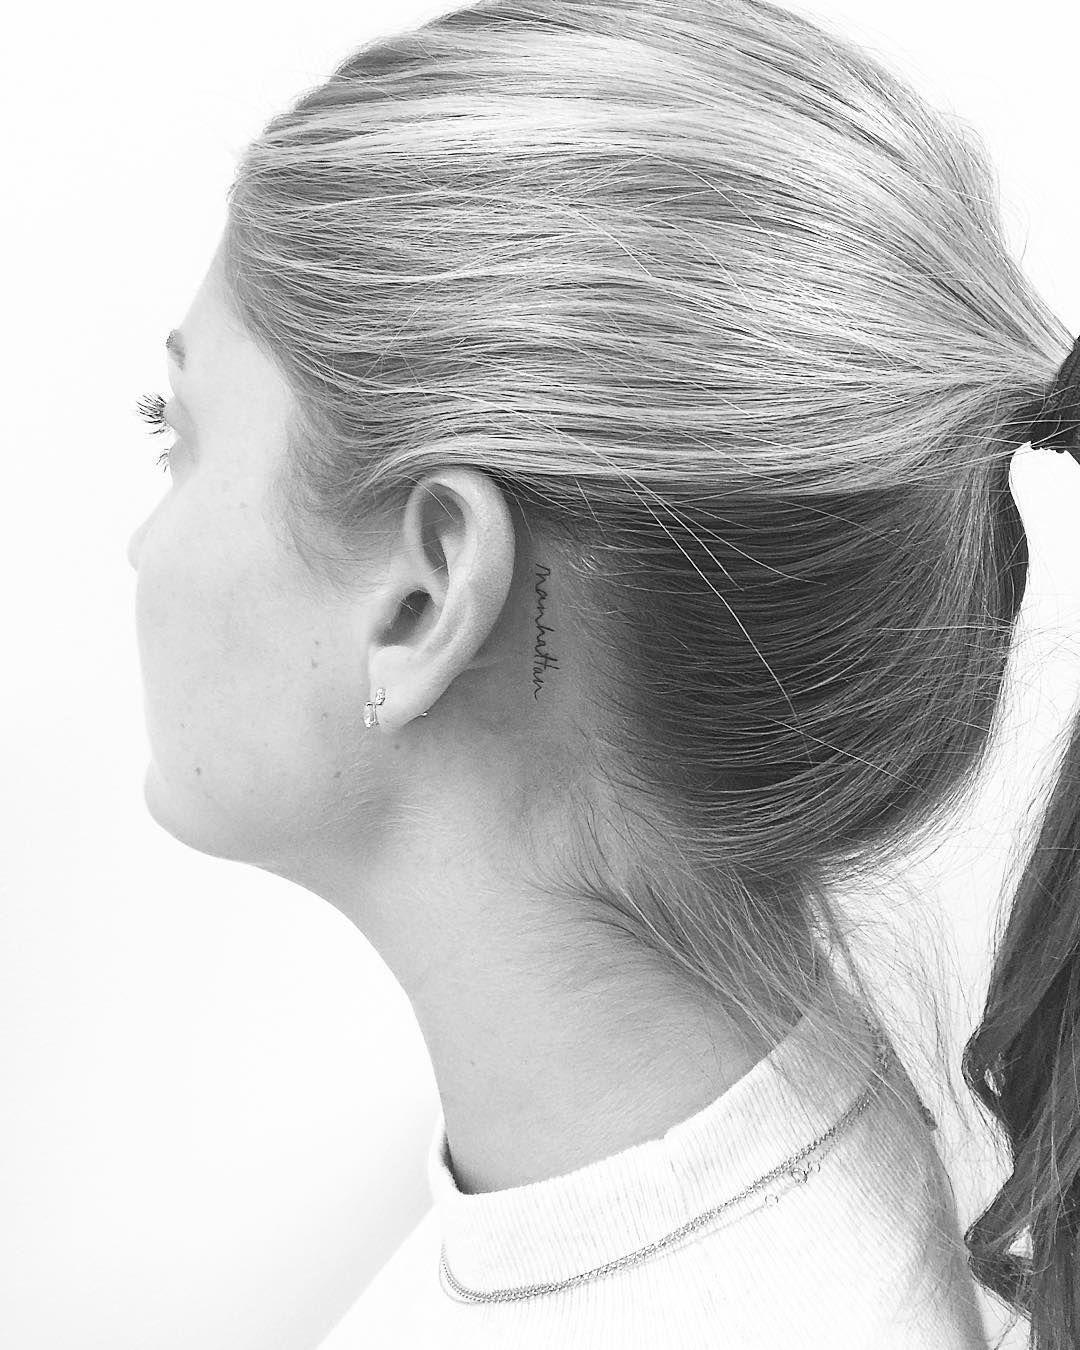 C S Jon Boy P V On Instagram Manhattan Jonboytattoo Behind Ear Tattoos Cute Small Tattoos Celebrity Tattoos